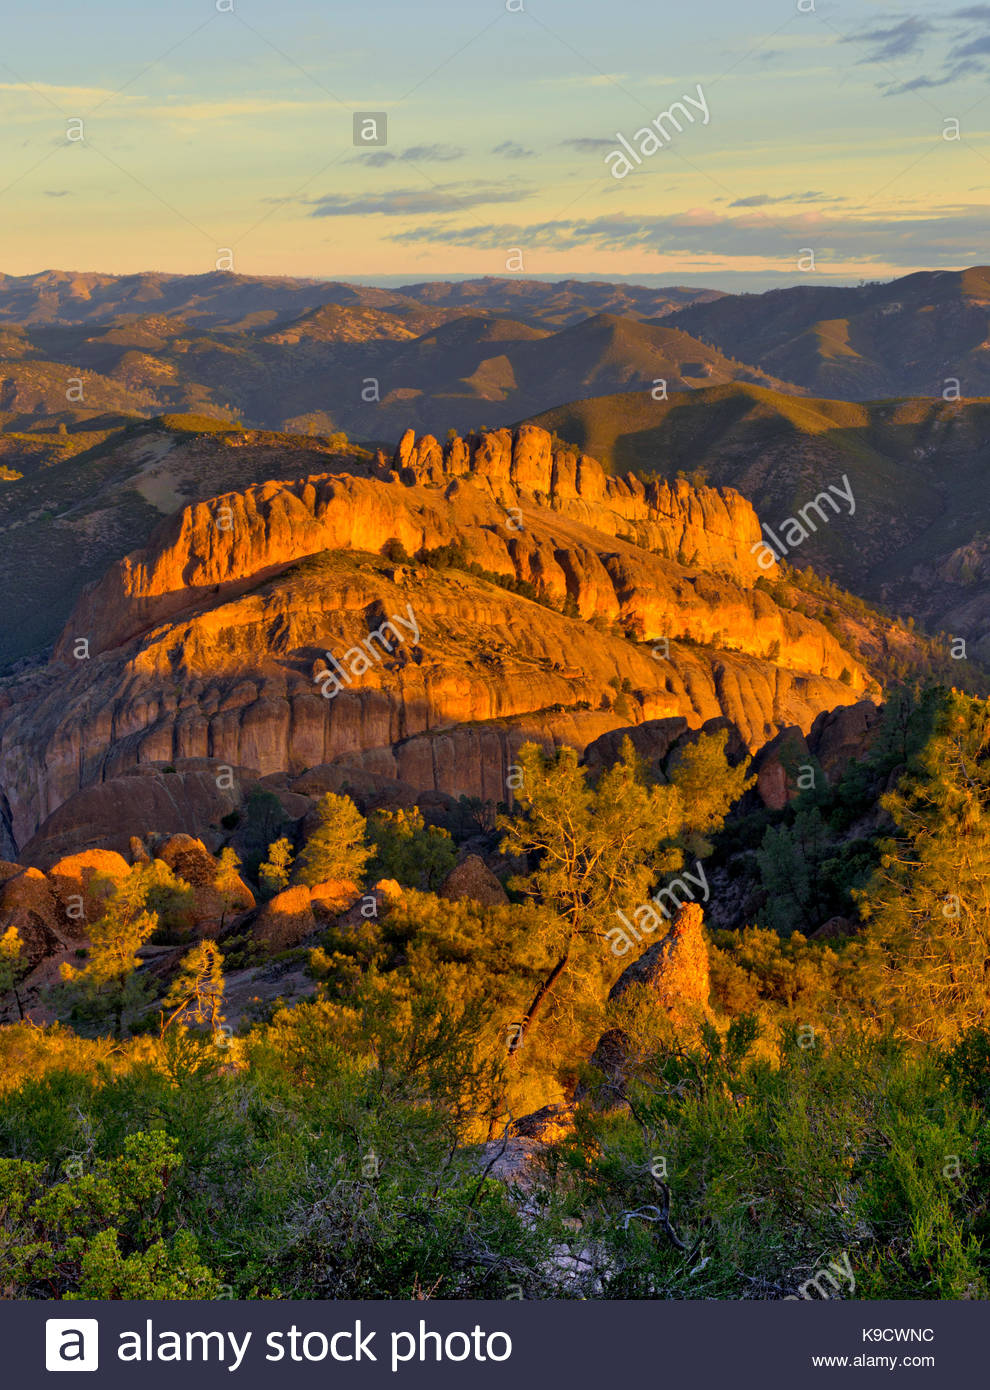 The Balconies at Sunrise, Pinnacles National Park, California - Stock Image